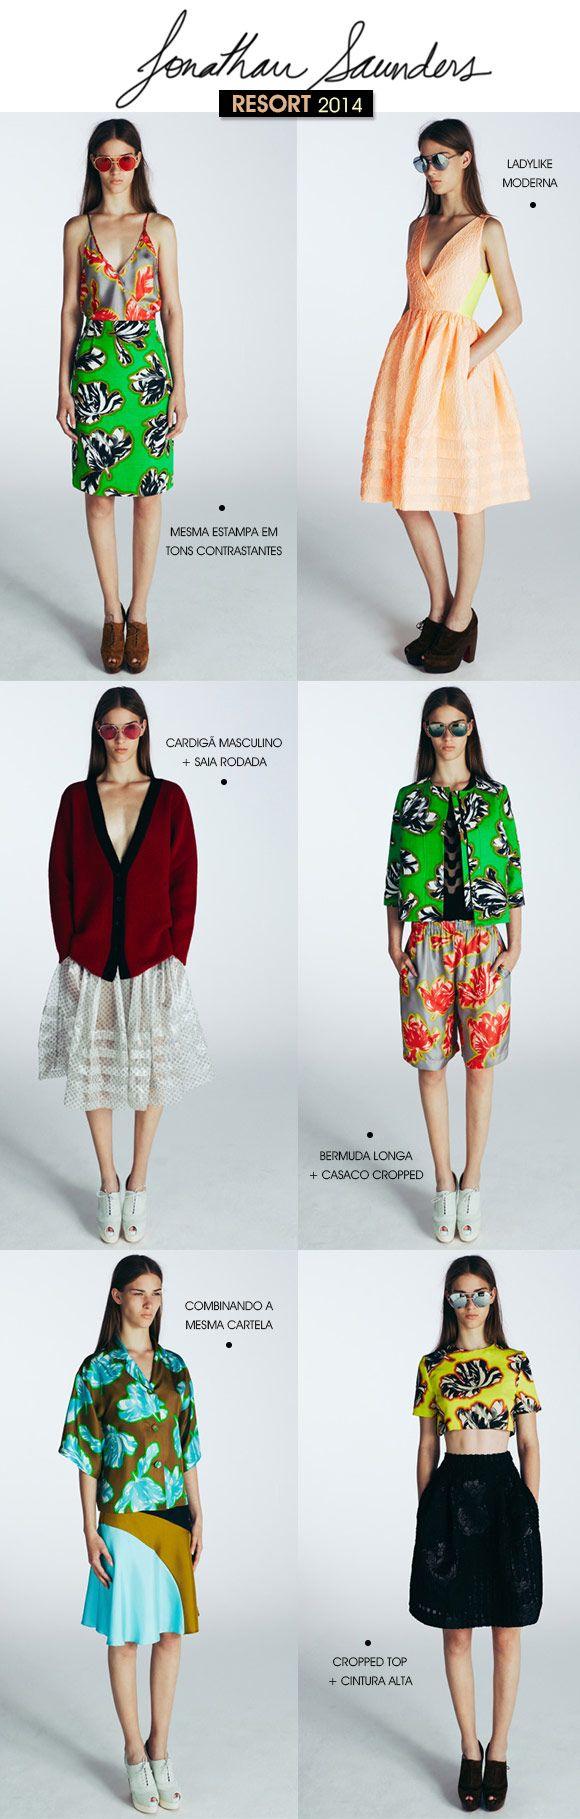 Achados da Bia | Moda | Jonathan Saunders | Resort 2014